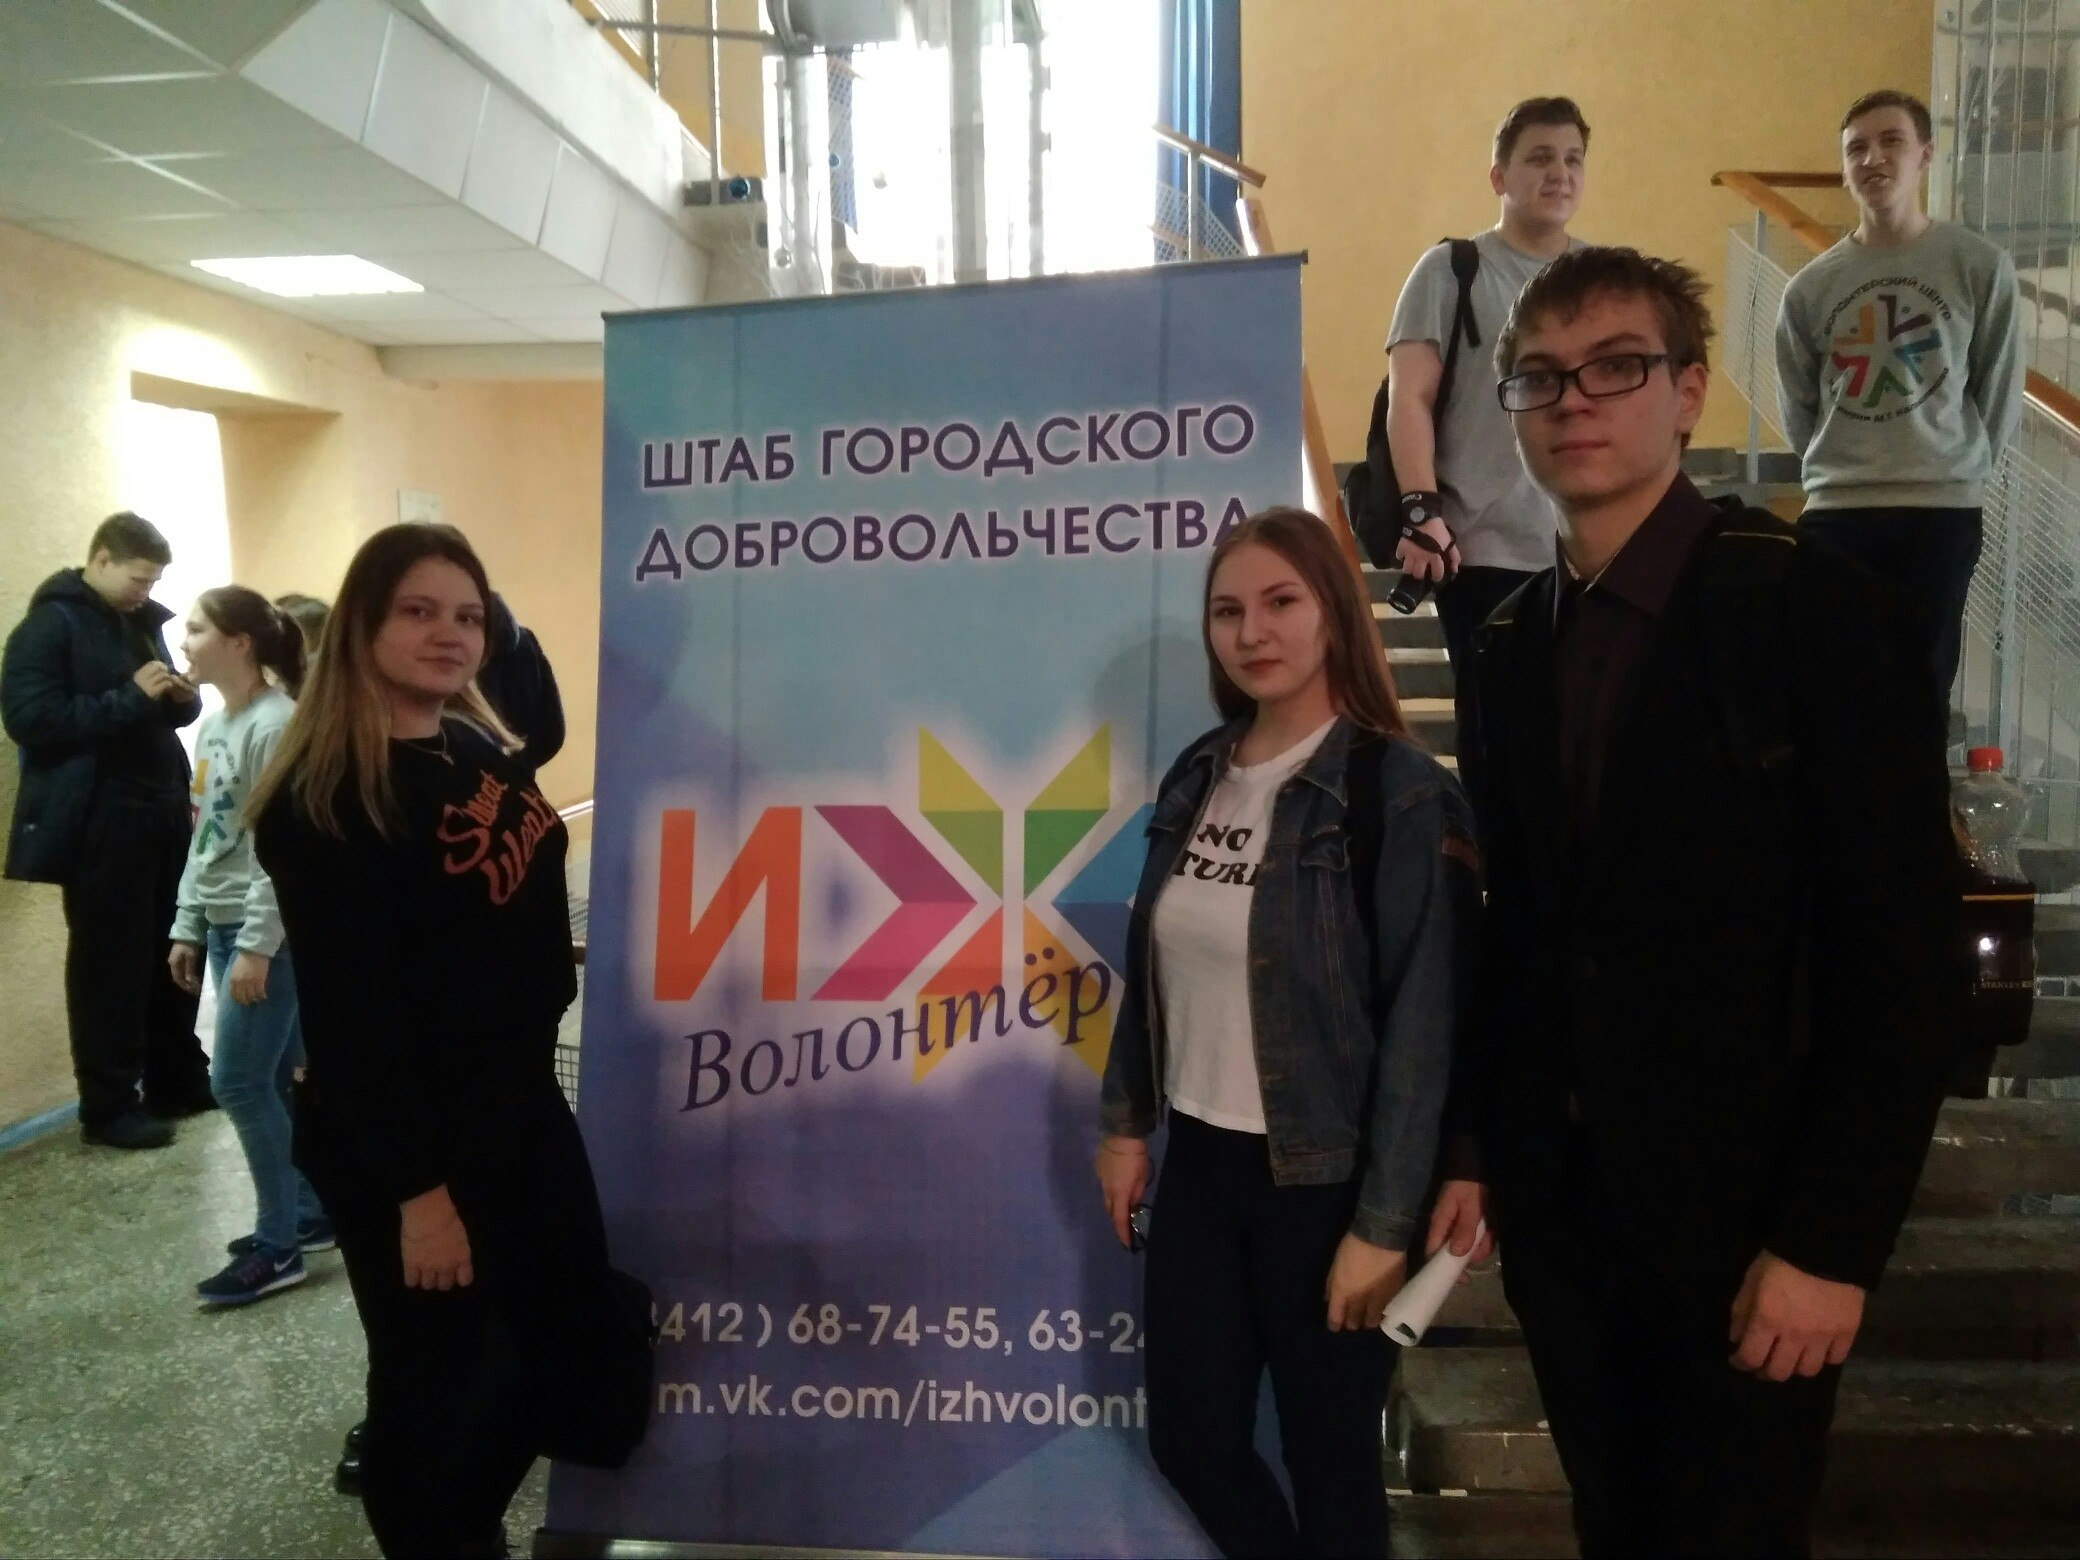 http://ciur.ru/imt/SiteAssets/logo_70.png